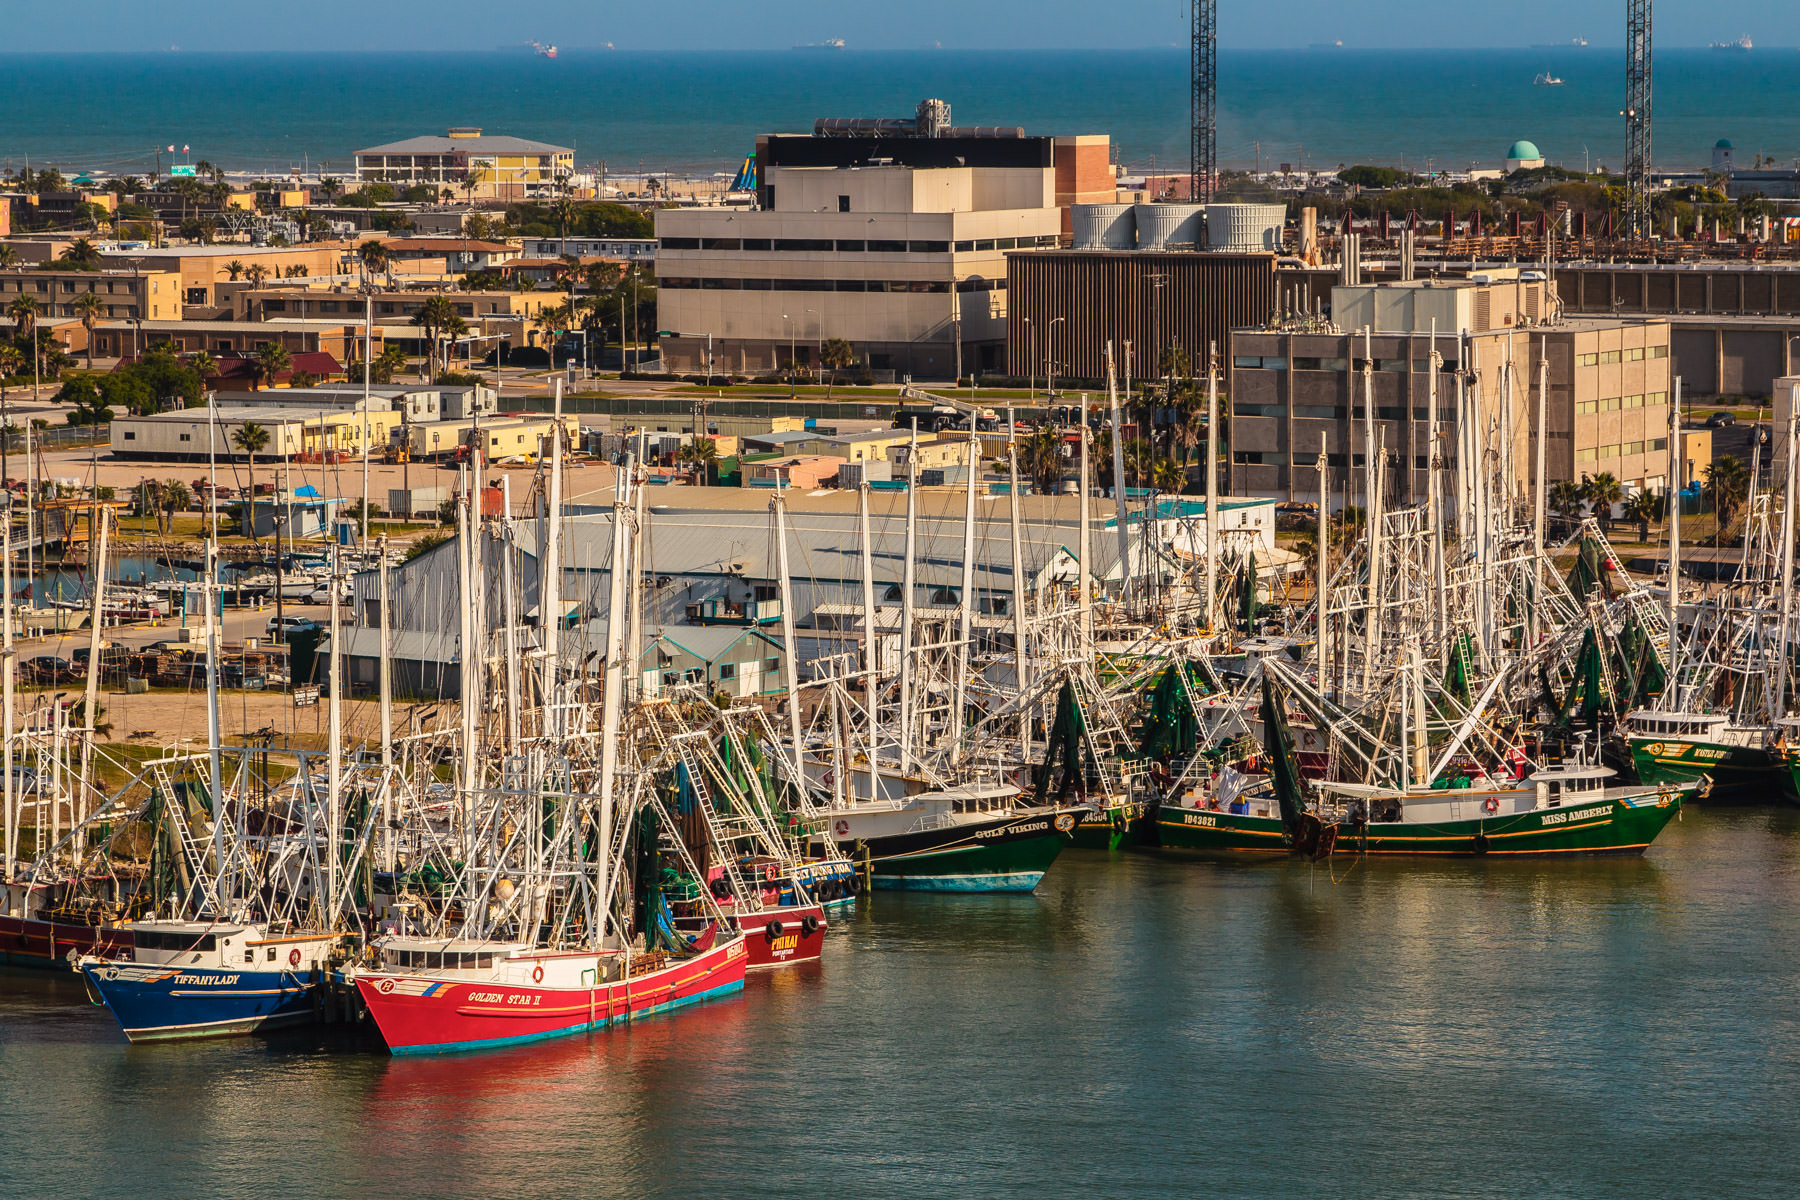 Shrimp trawlers docked in Galveston Harbor, Galveston, Texas.